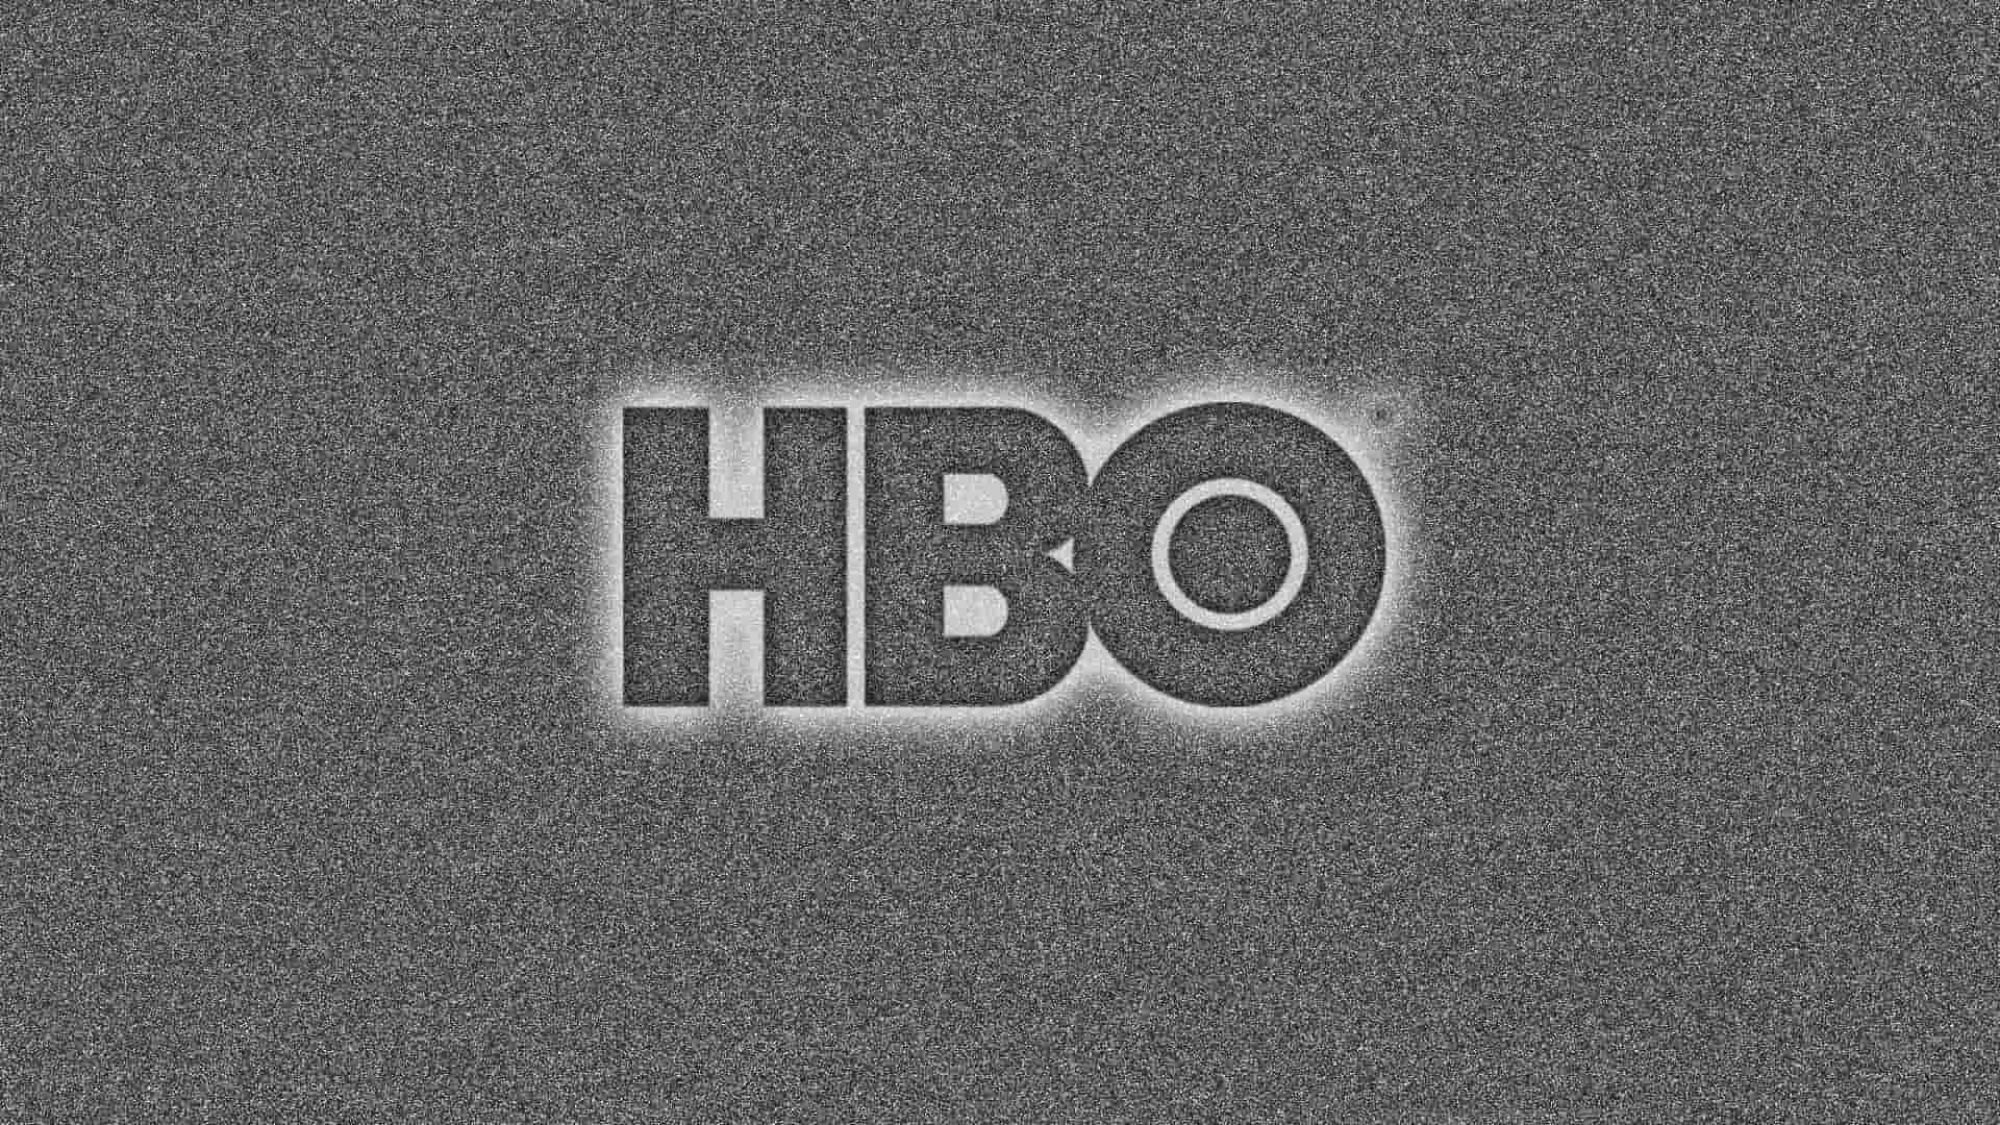 Телеканал HBO запустил в разработку «Сферу» Майкла Крайтона